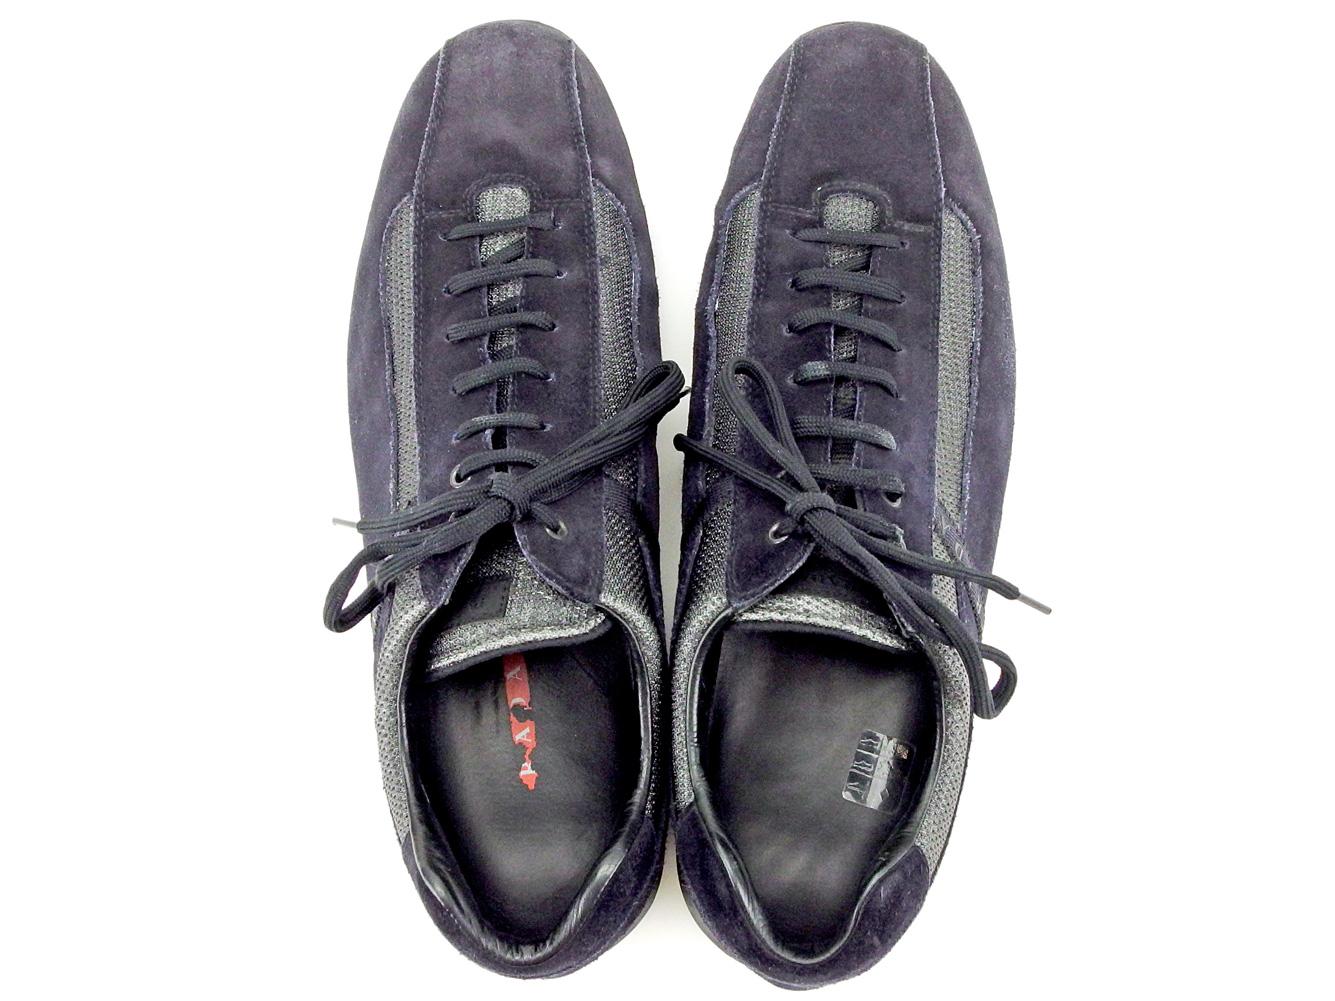 5a0a3bc86 ... Prada PRADA sneakers sports shoes shoes men black nylon X leather  popularity sale C2944 ...